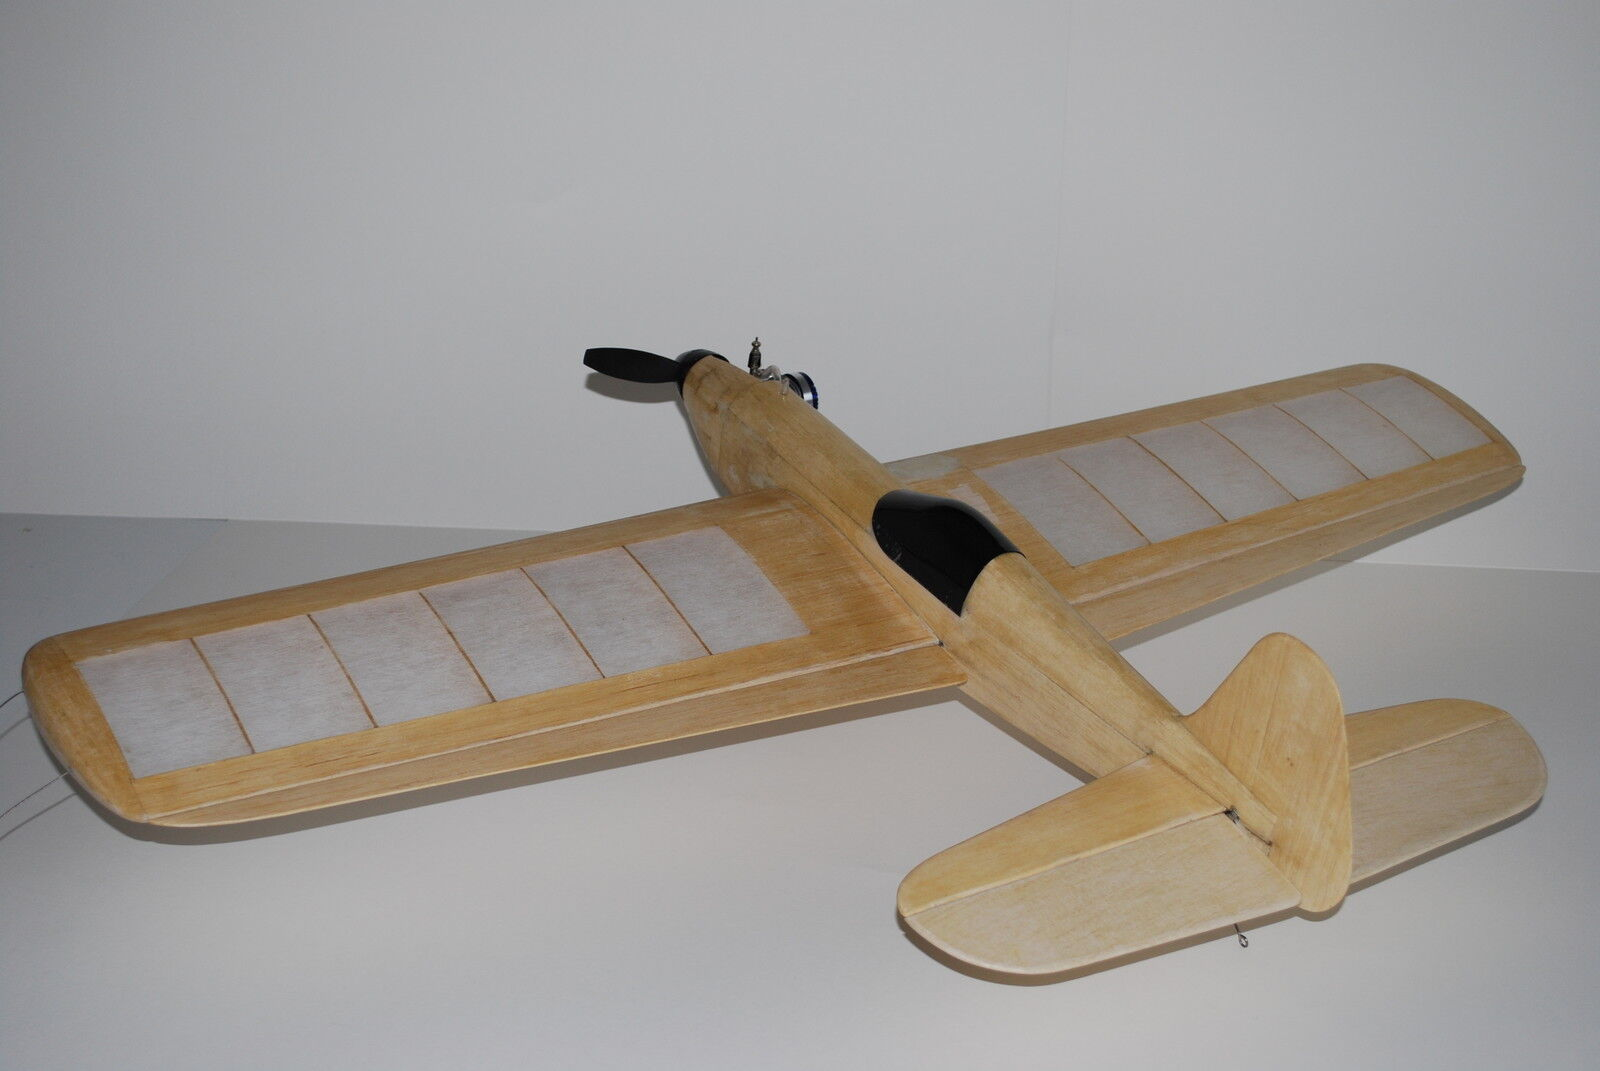 Vintage Frog Aerobat 38  Span Control Line Aerobatic Stunt Laser Cut Kit